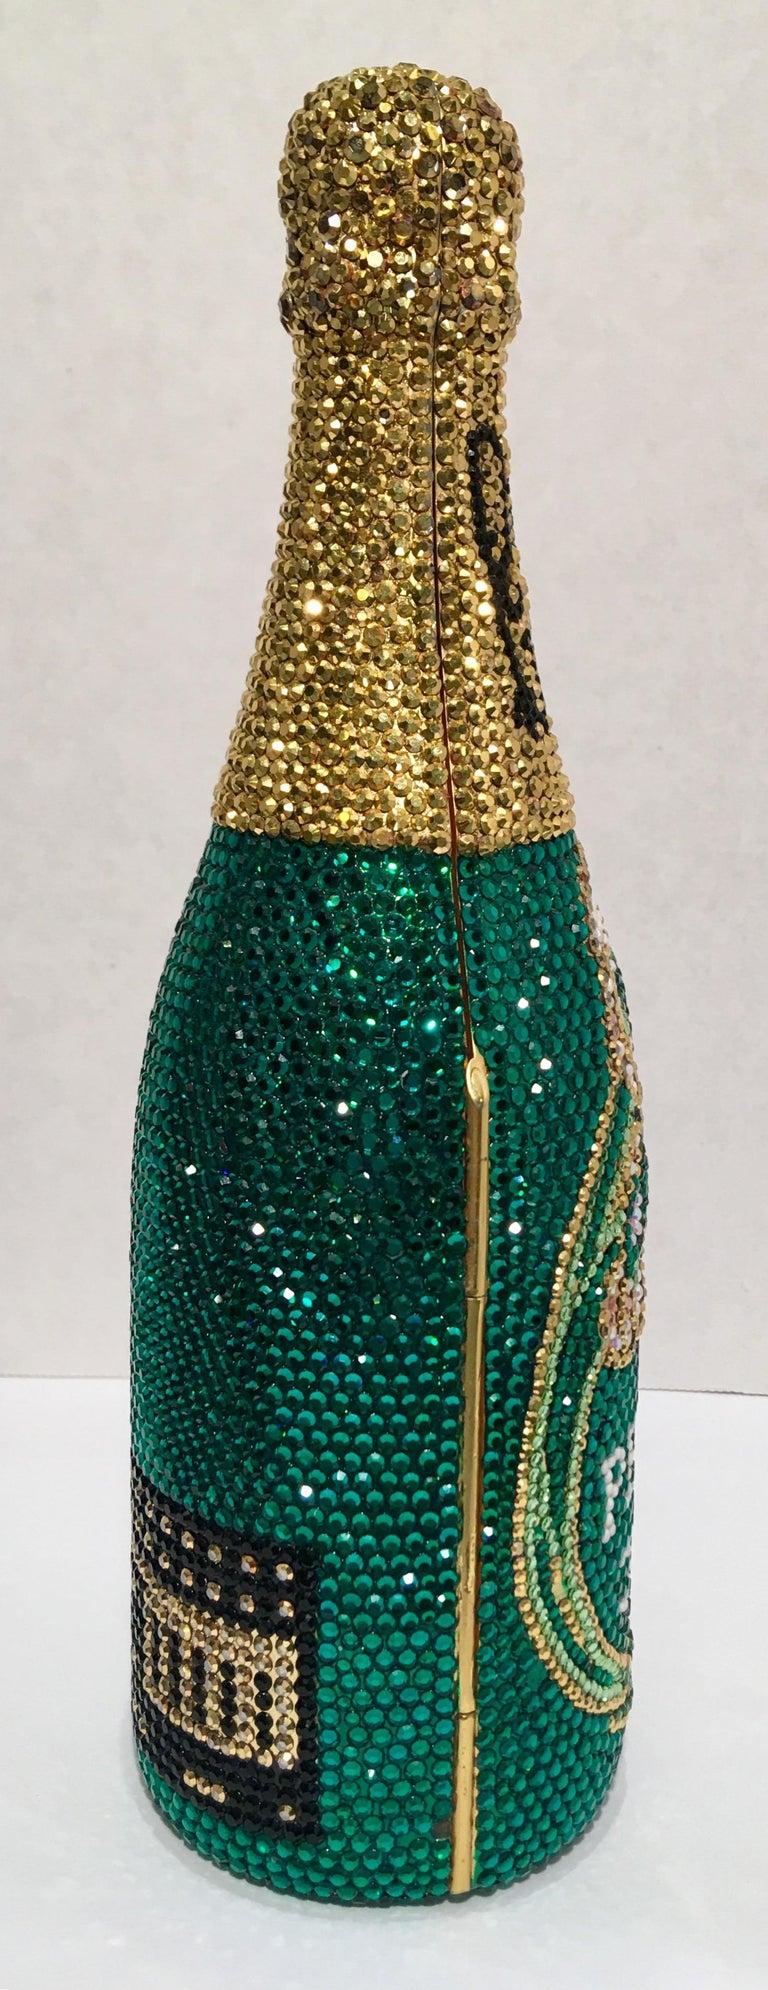 Women's Kathrine Baumann Limited Edition Perrier Jouet Bottle Miniaudiere Evening Bag For Sale